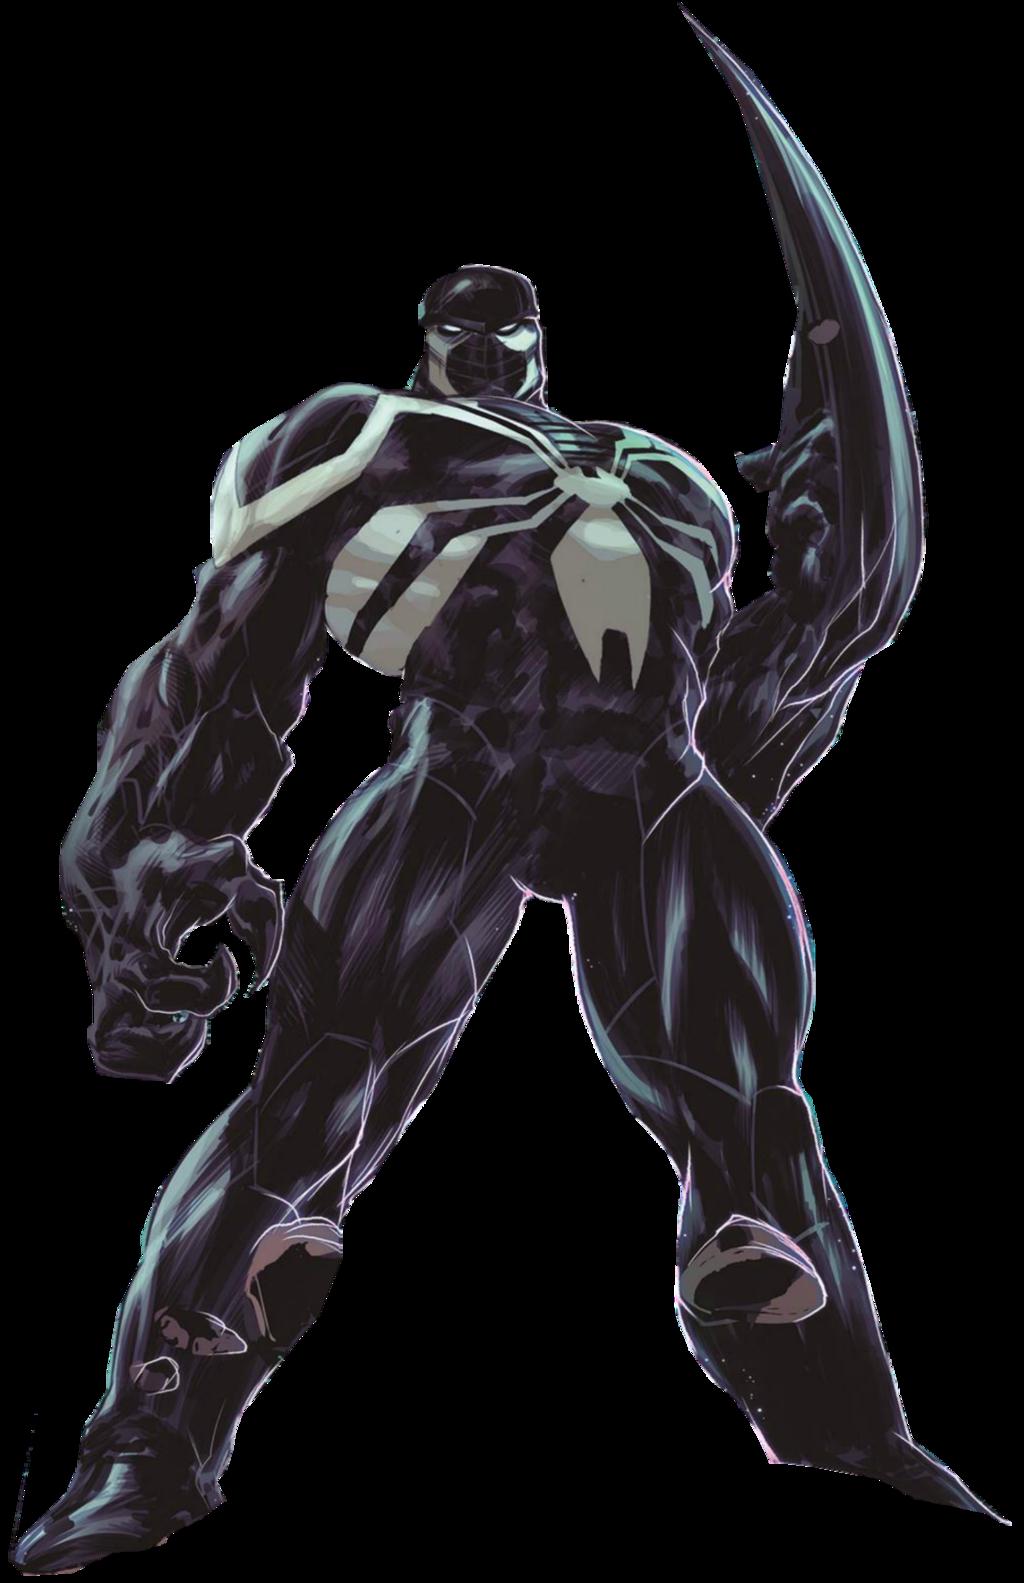 Agent Venom wallpapers, Comics, HQ Agent Venom pictures ...